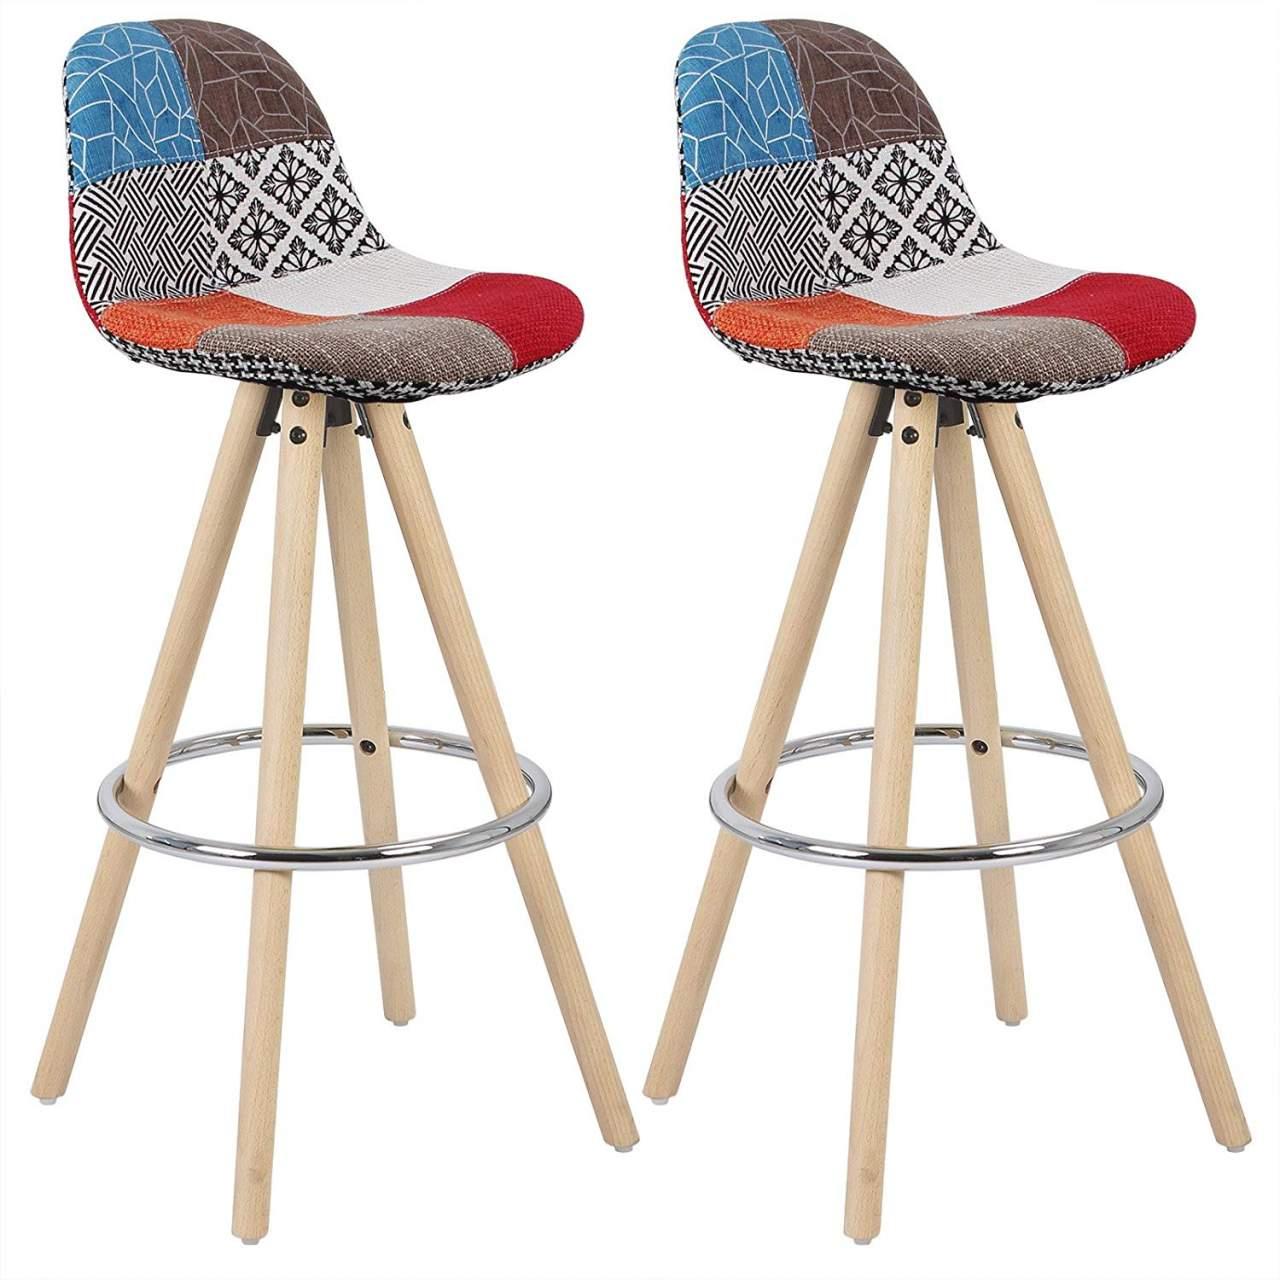 9 pcs Barstools Dark Grey Breakfast Kitchen Counter Bar Chairs Wood Leg